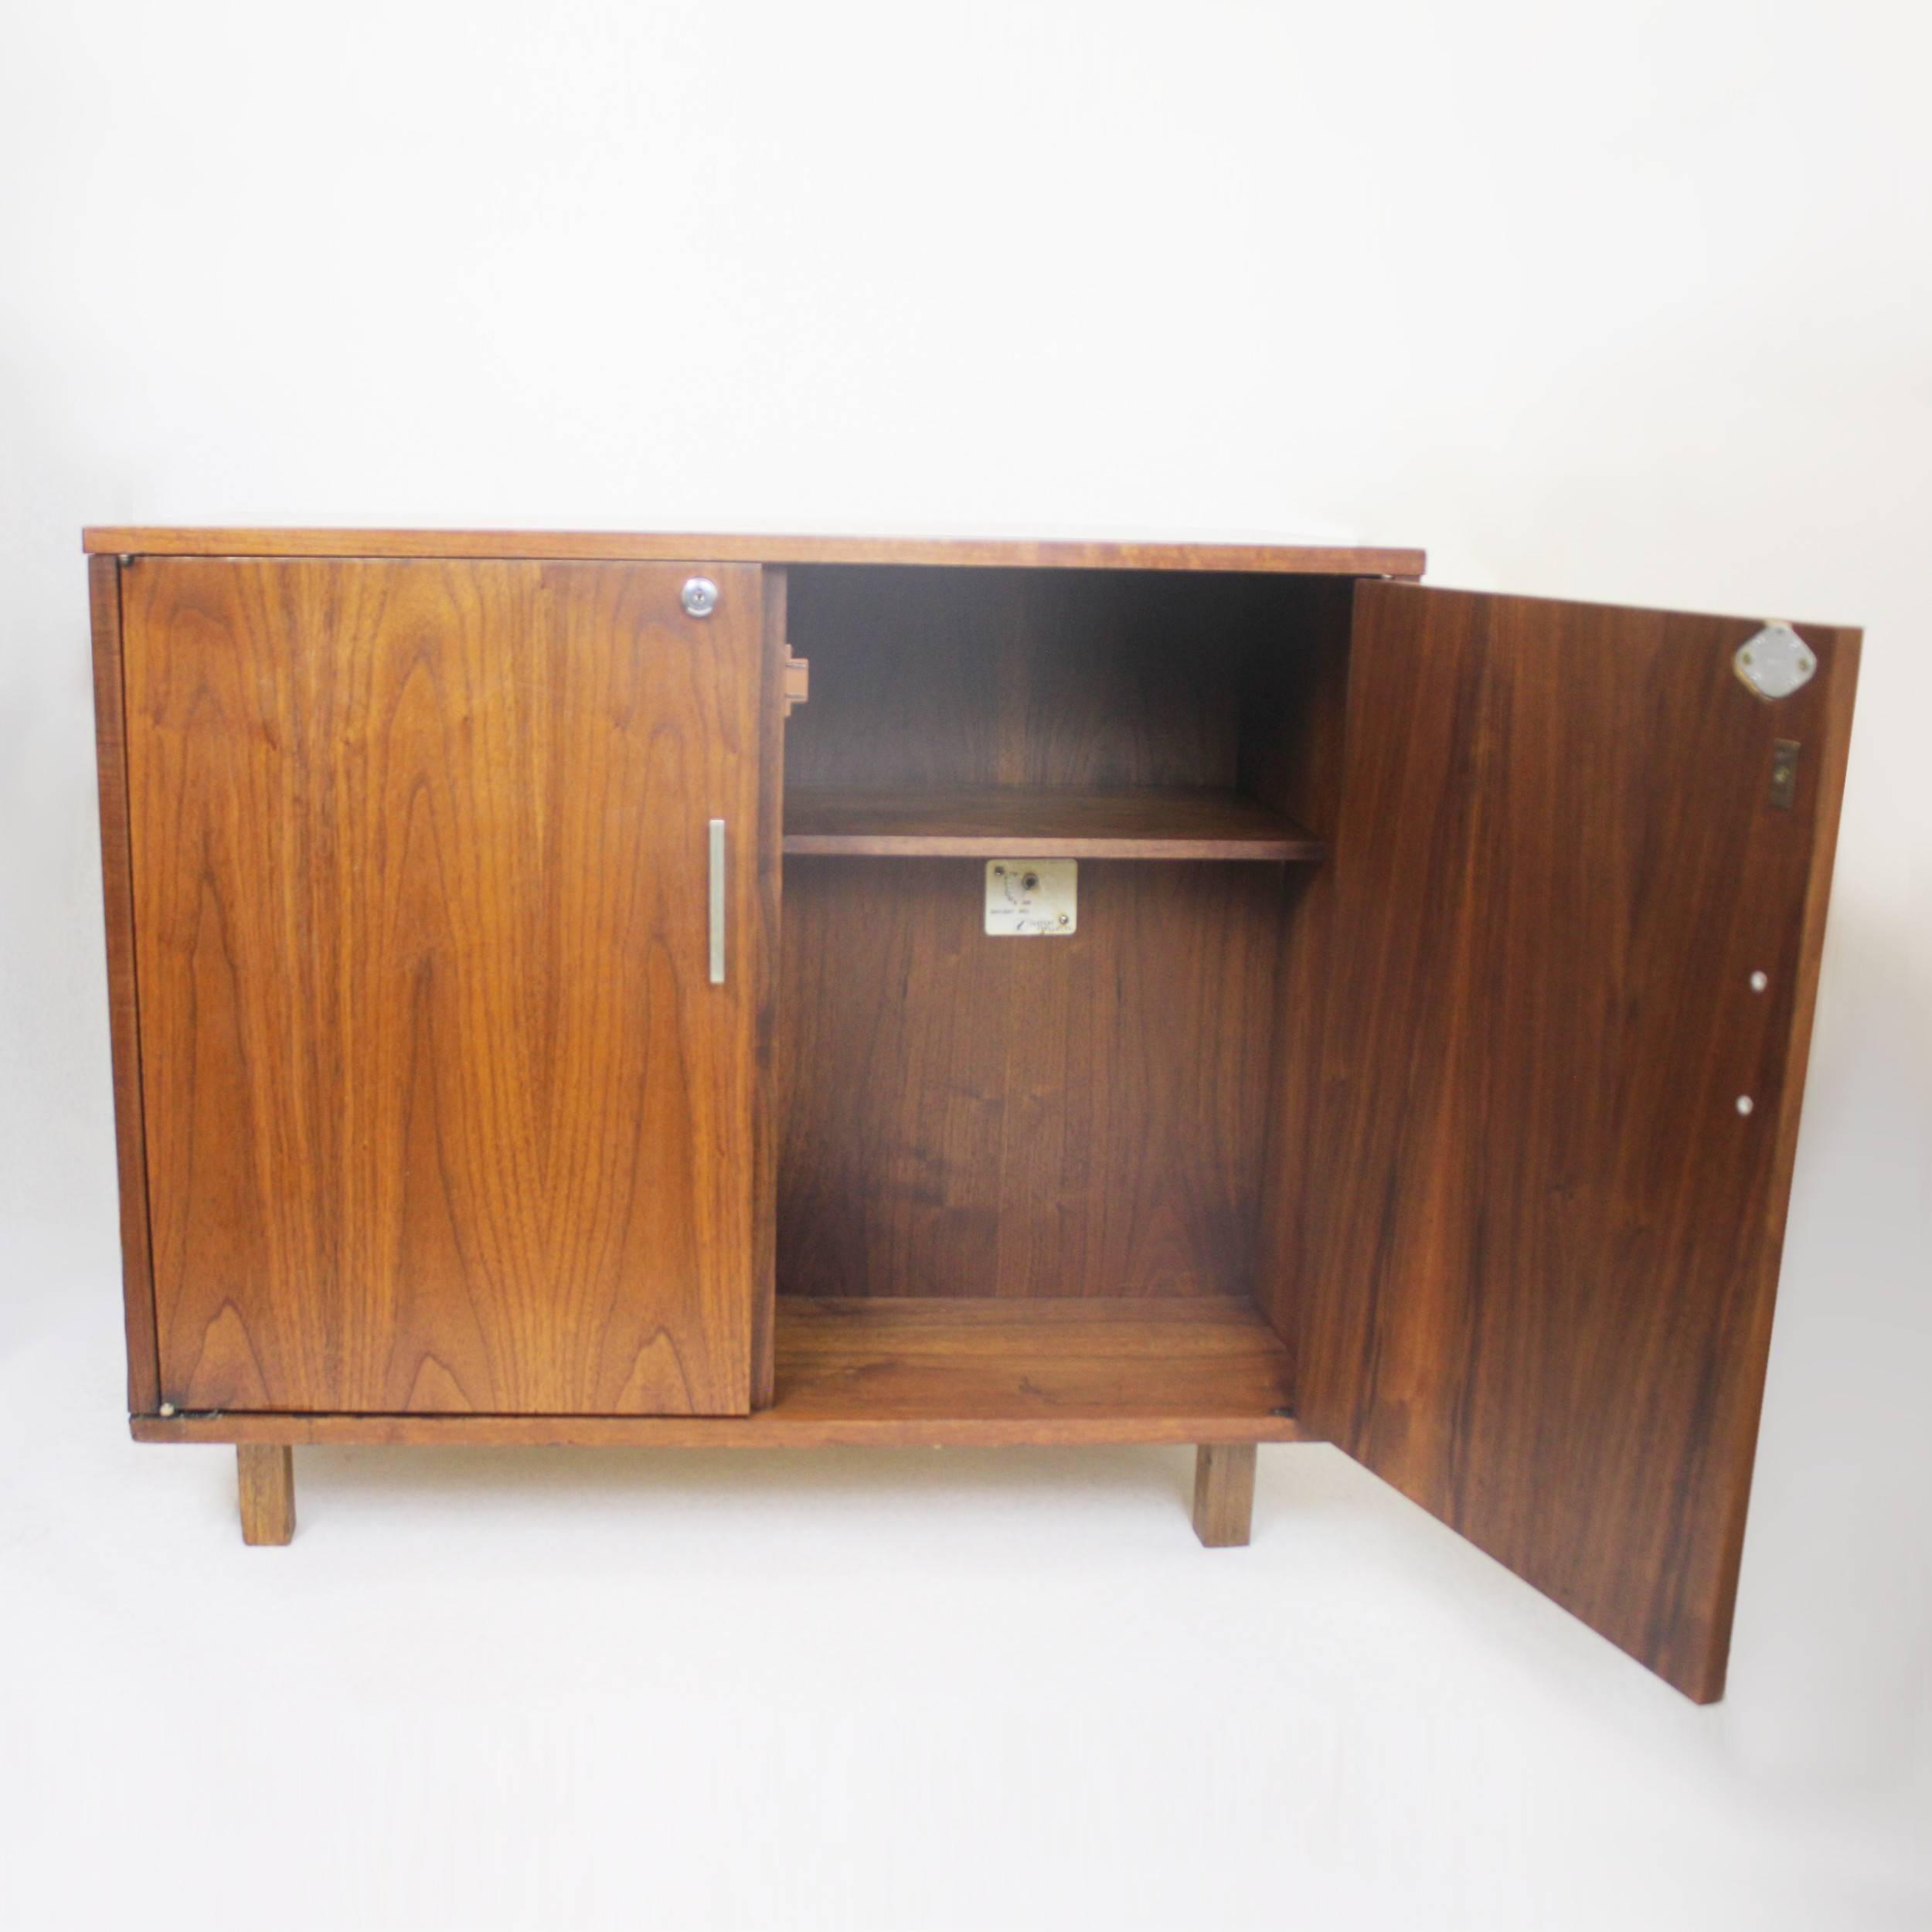 Vintage 1960u0027s Mid-Century Modern Walnut Mini Bar Fridge Liquor Cabinet In Excellent Condition For & Vintage 1960u0027s Mid-Century Modern Walnut Mini Bar Fridge Liquor ...